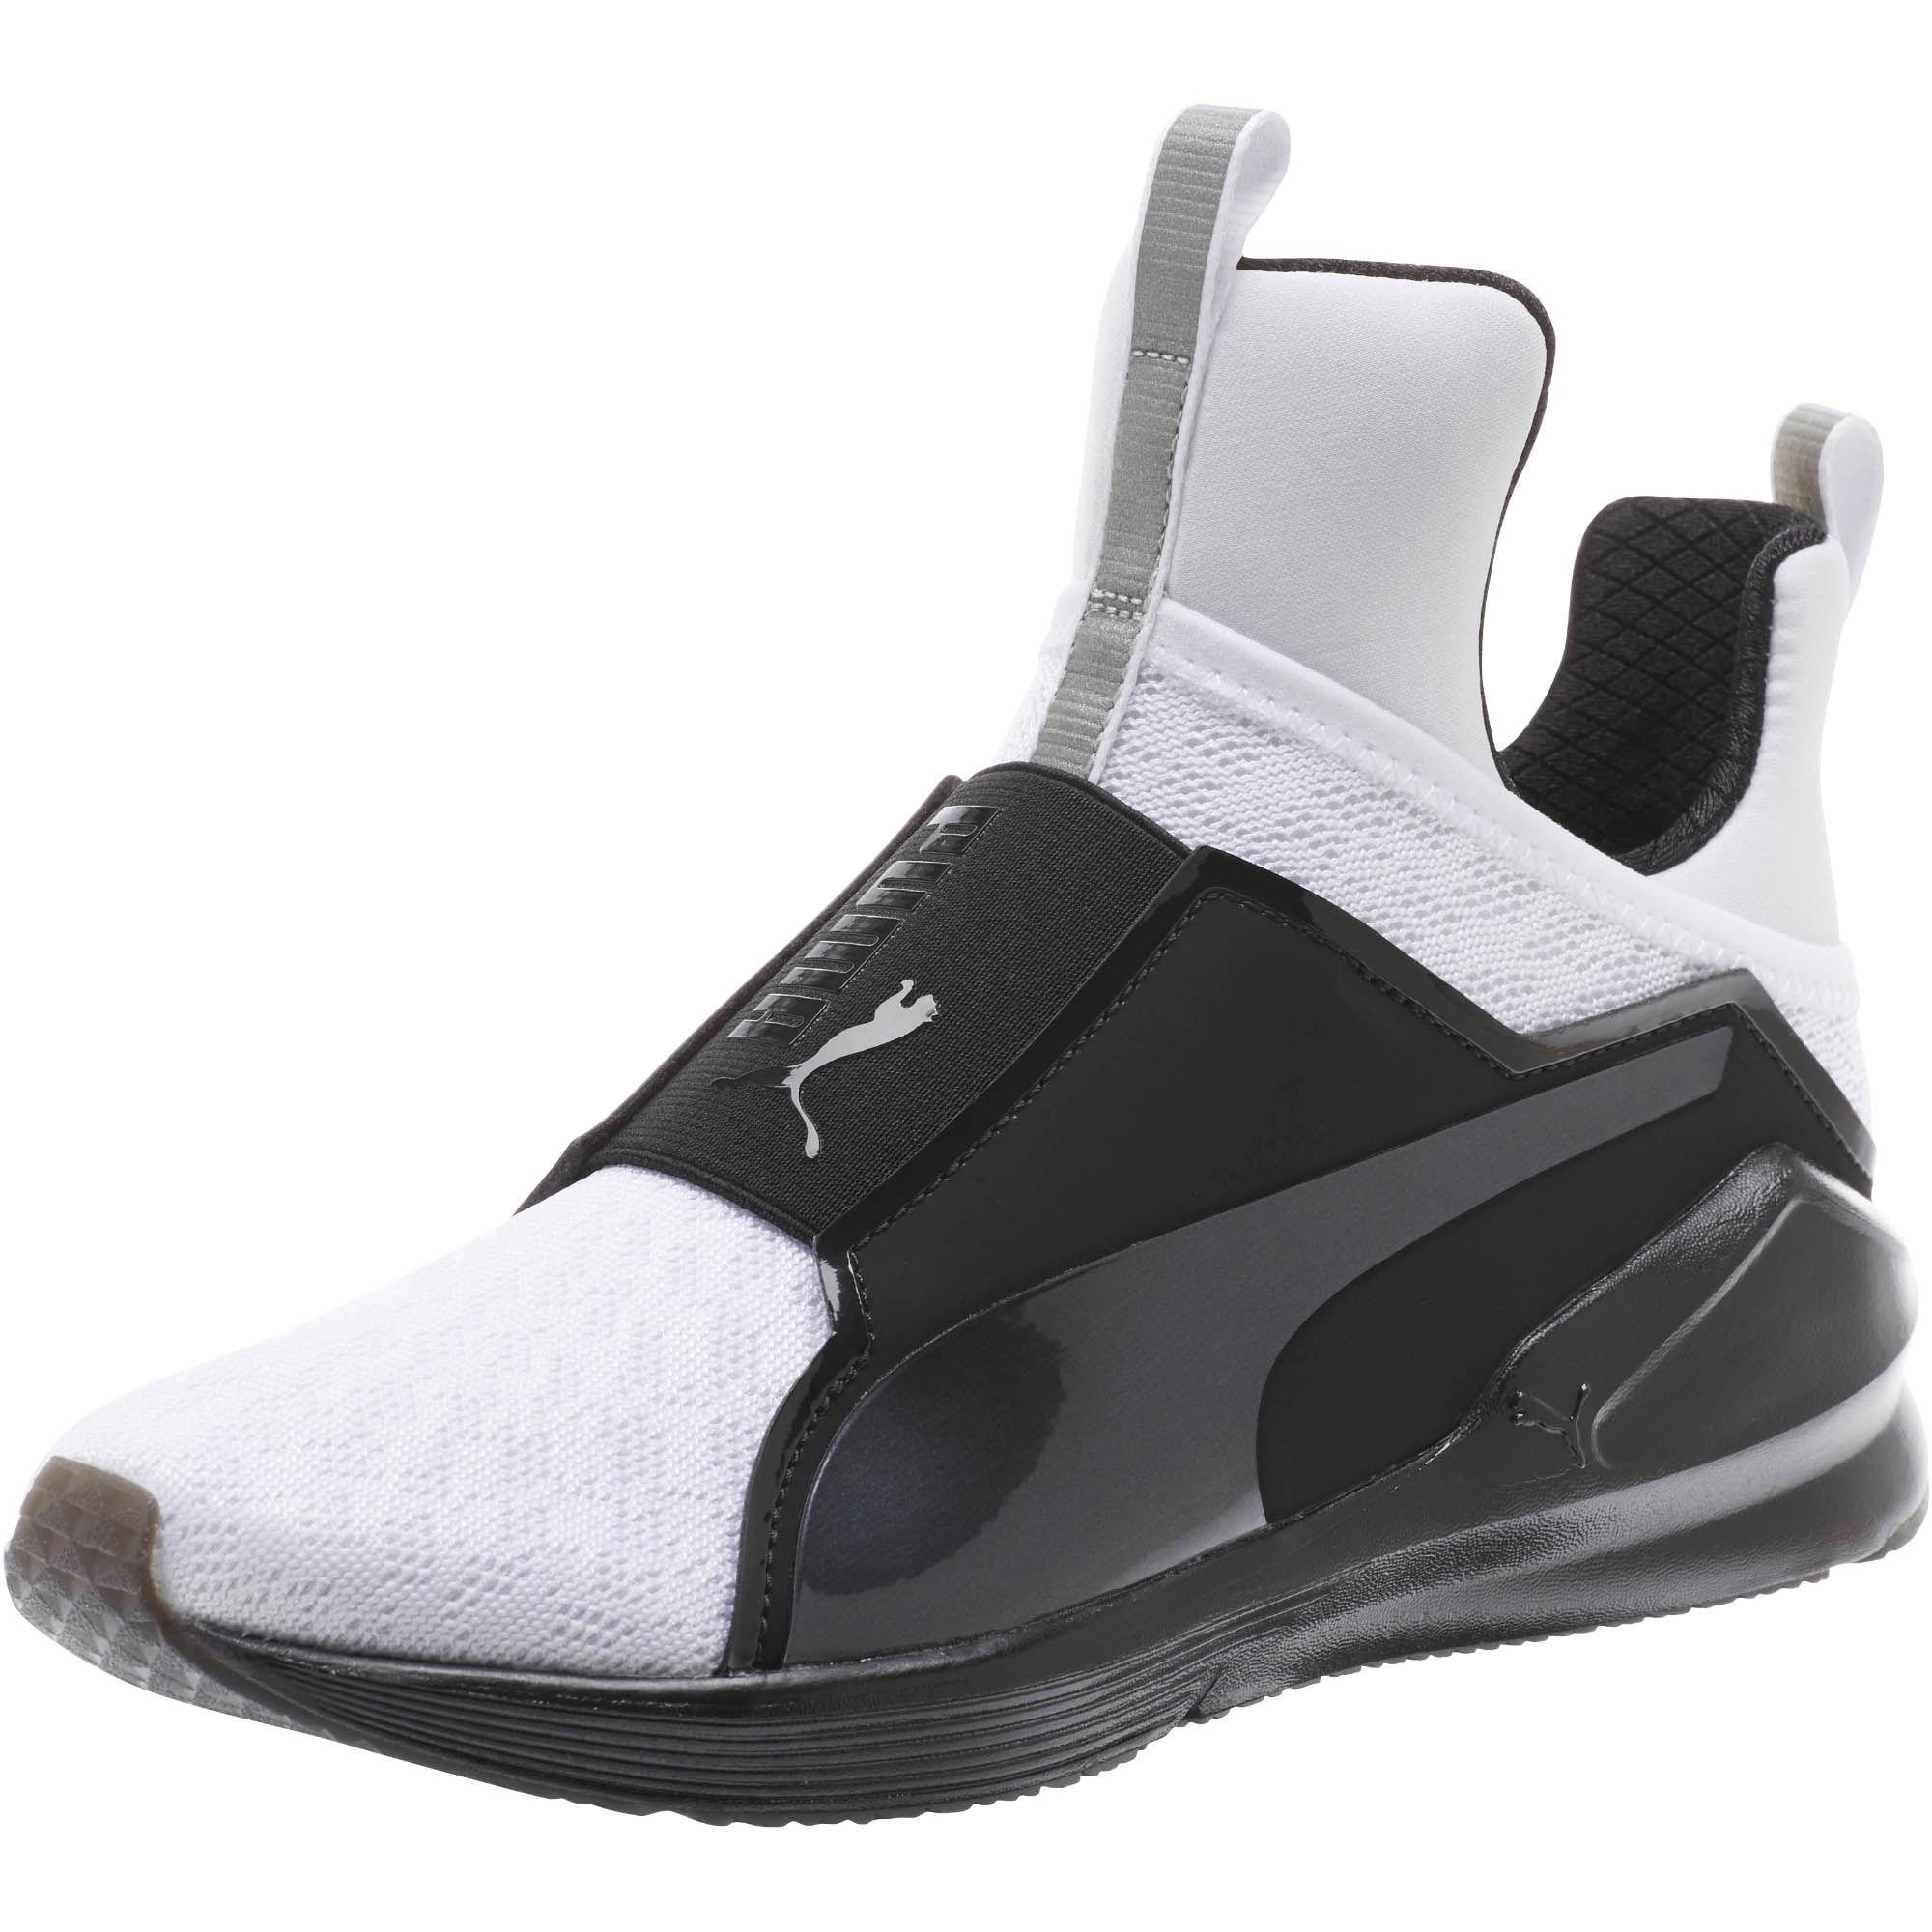 brand new 2ec76 3d5ef Black Fierce Varsity Women's Training Shoes